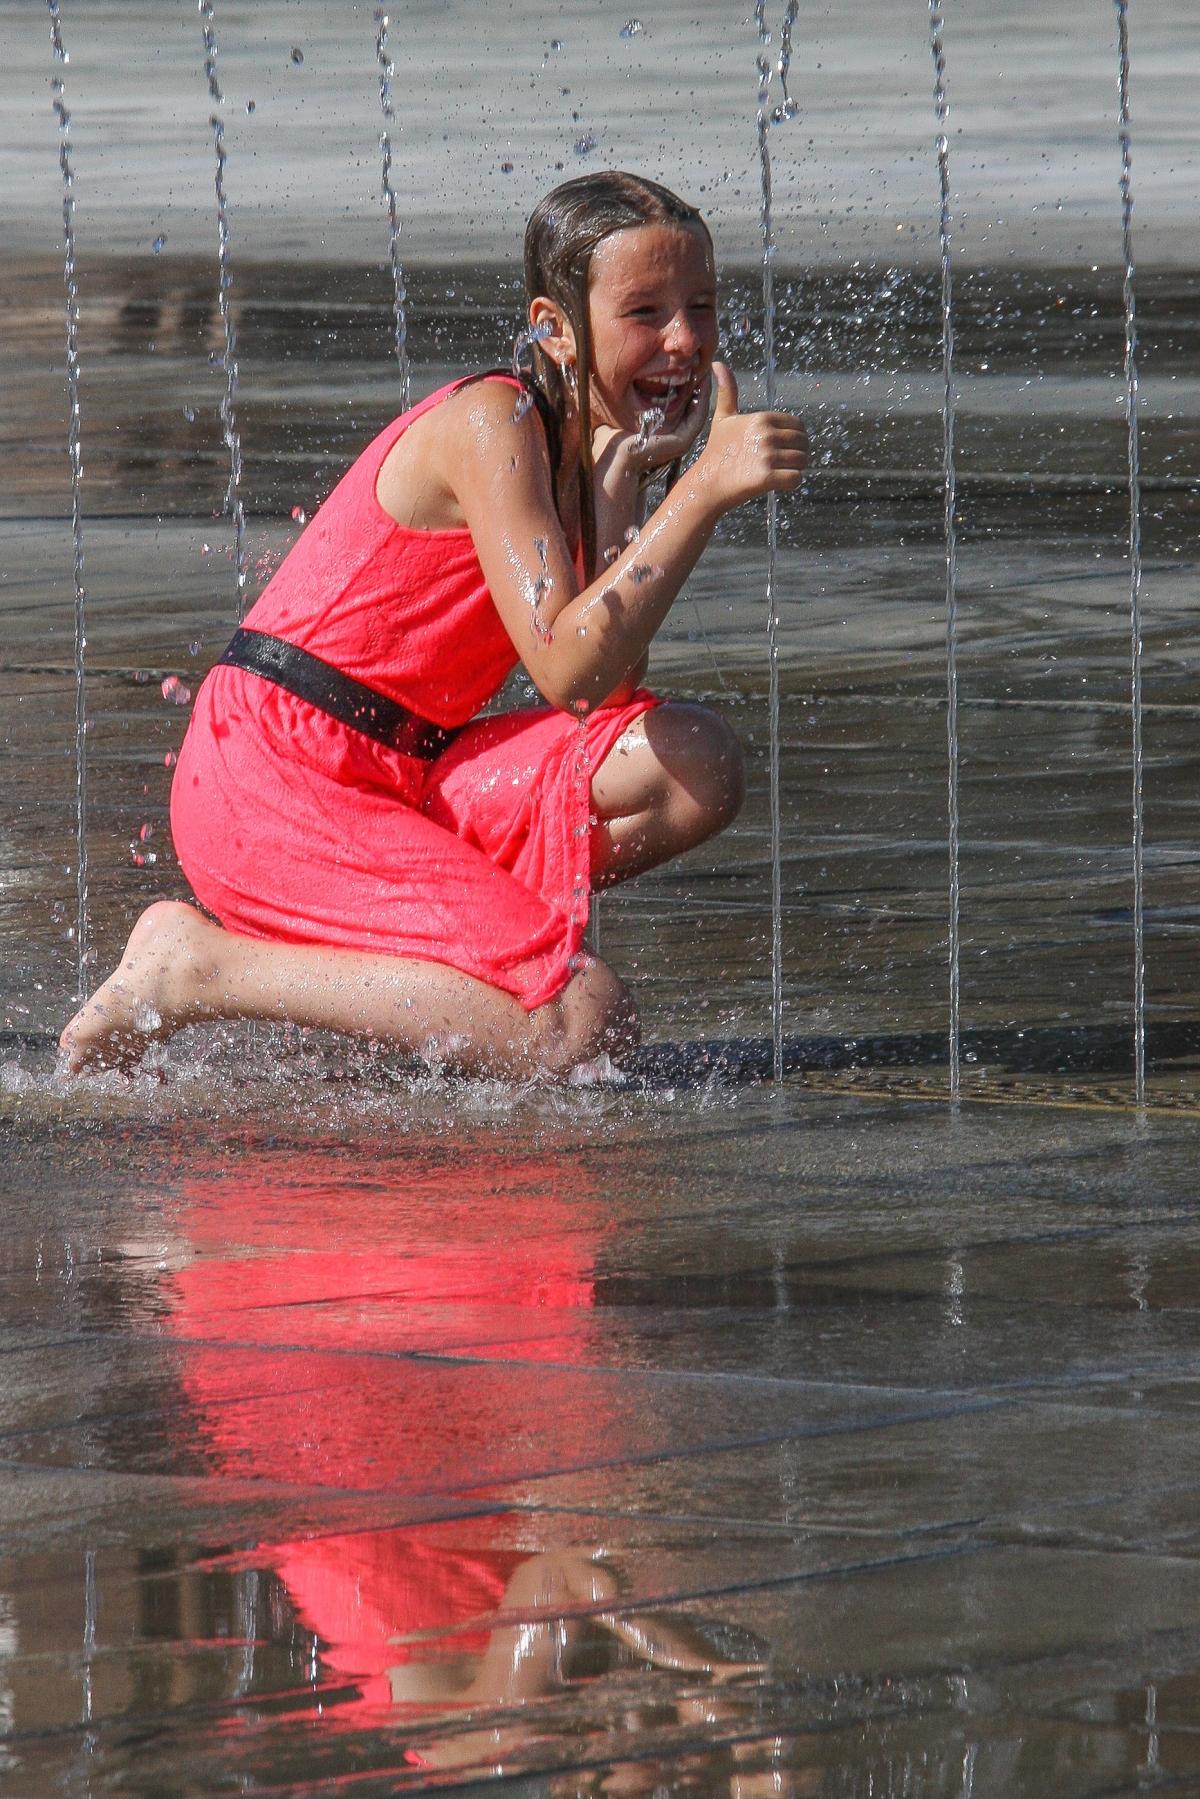 fountain-girl-panty